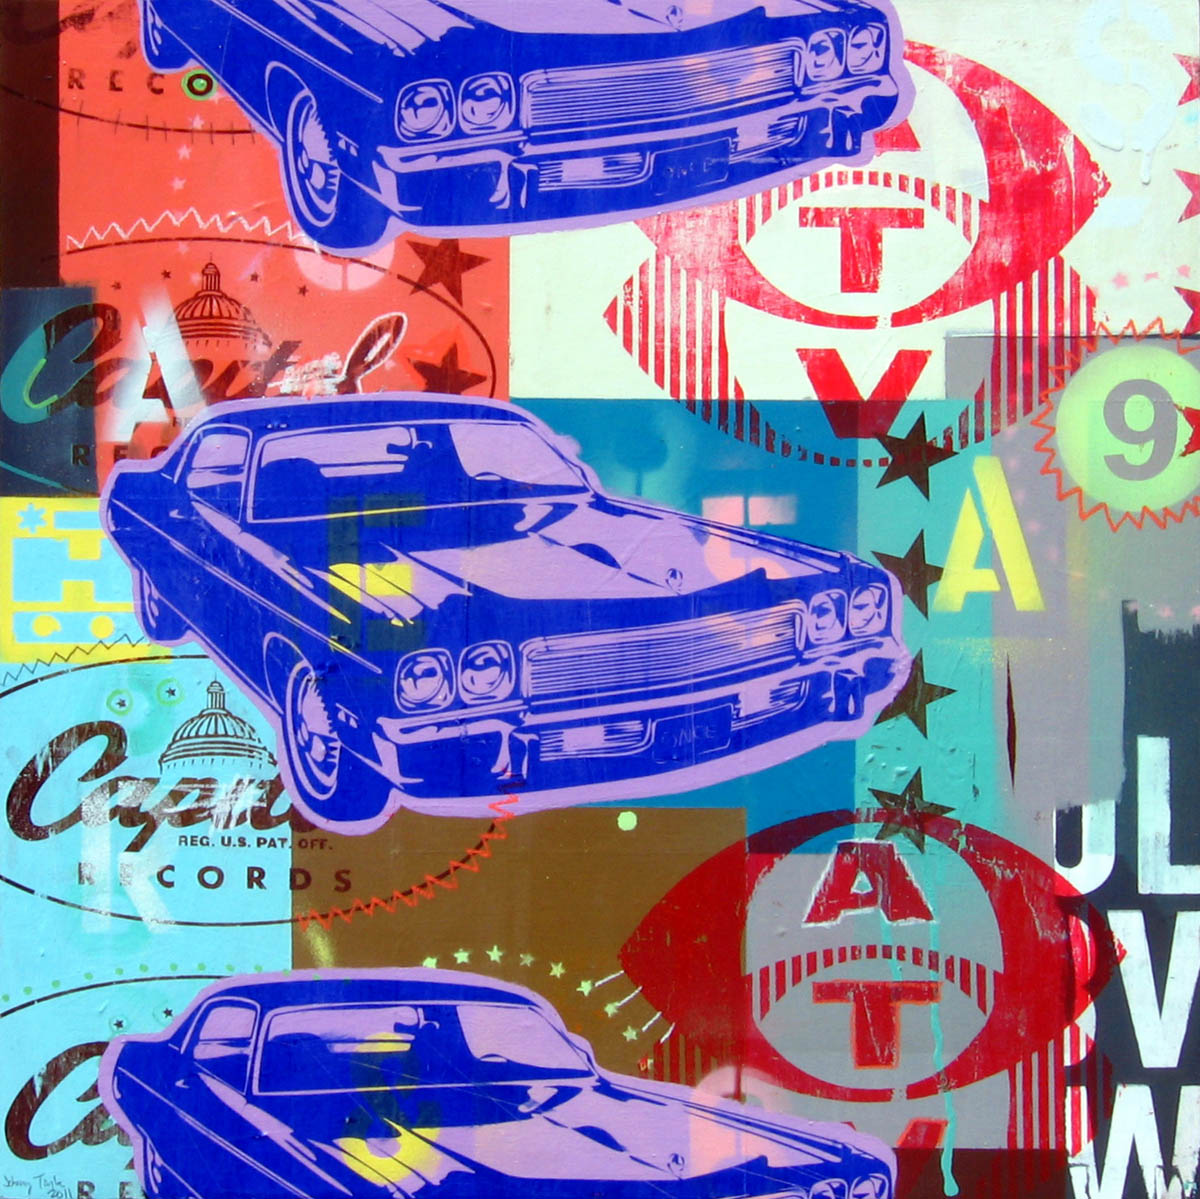 1970's vintage autos